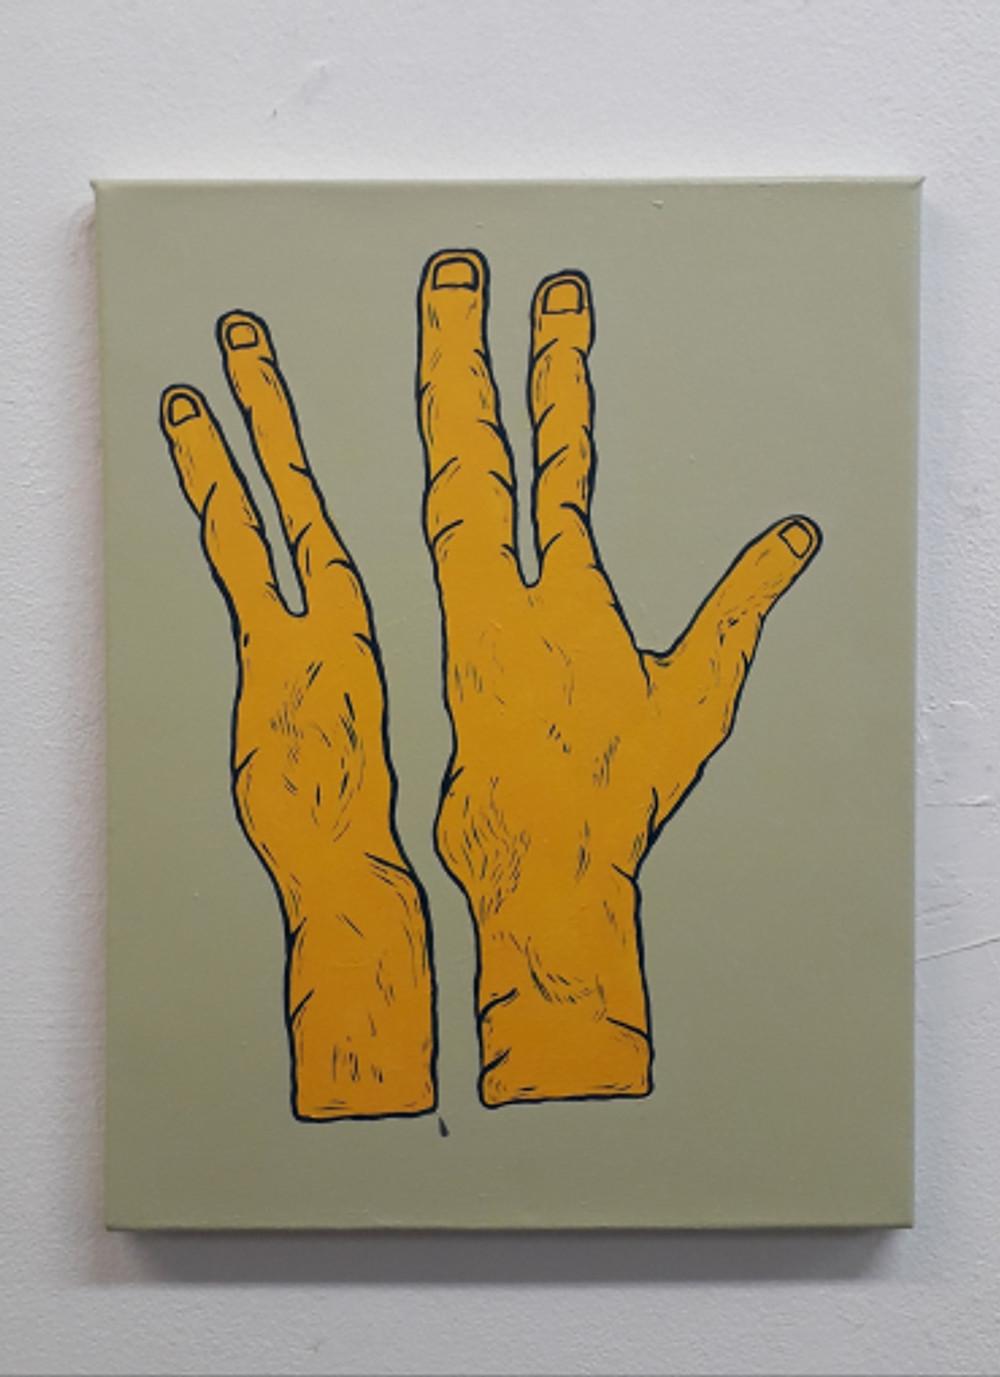 Fingerz, 50x60cm, Ακρυλικά σε καμβά, 2018